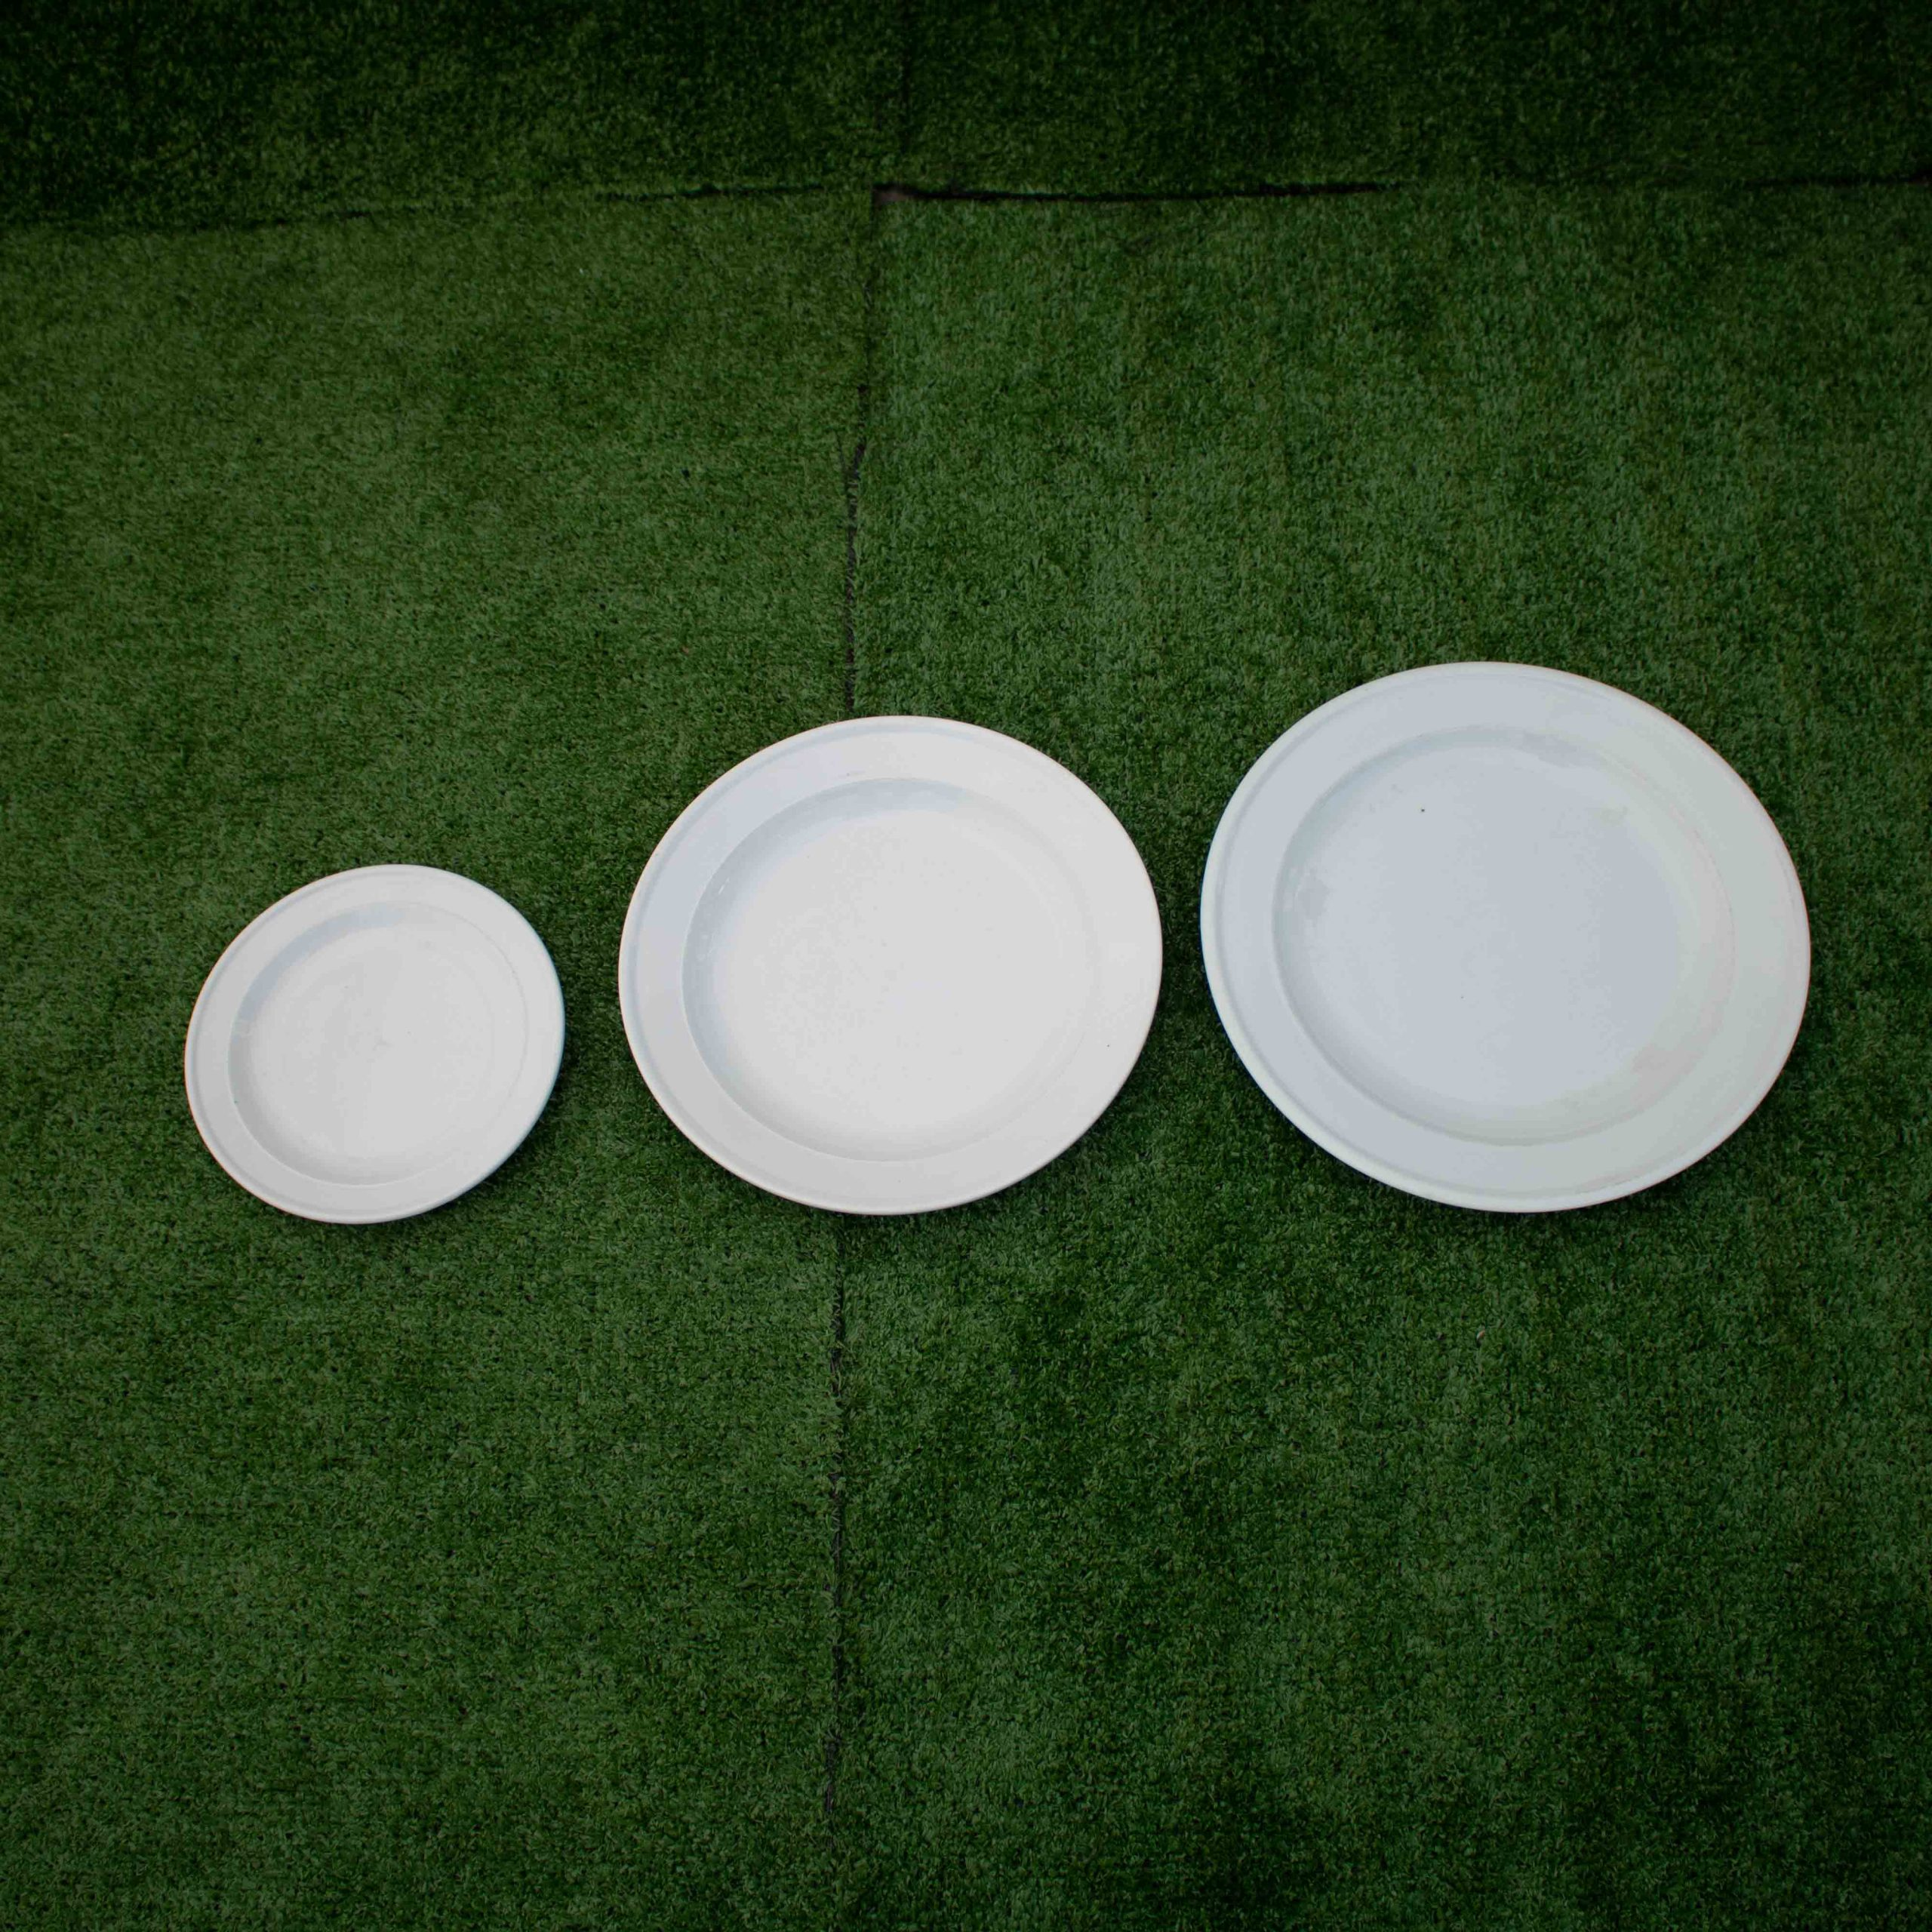 Standard Plate range